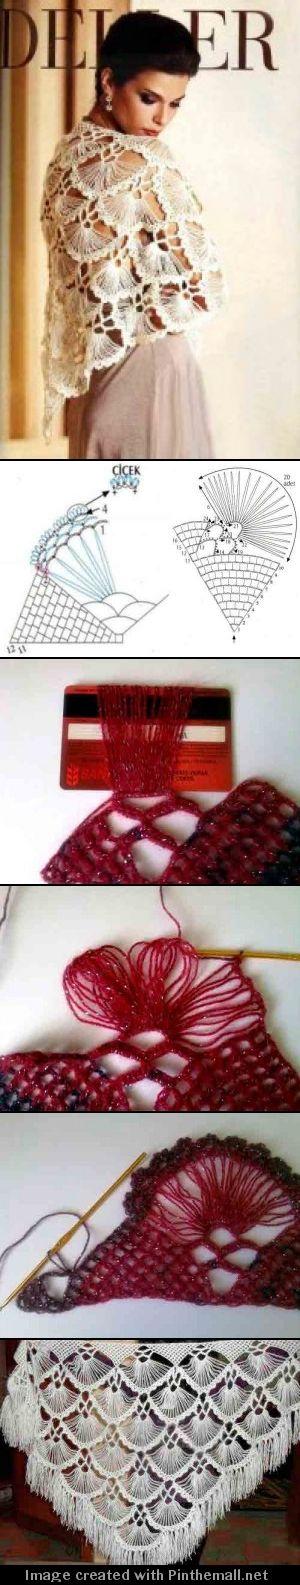 hairpin crochet lace shawl